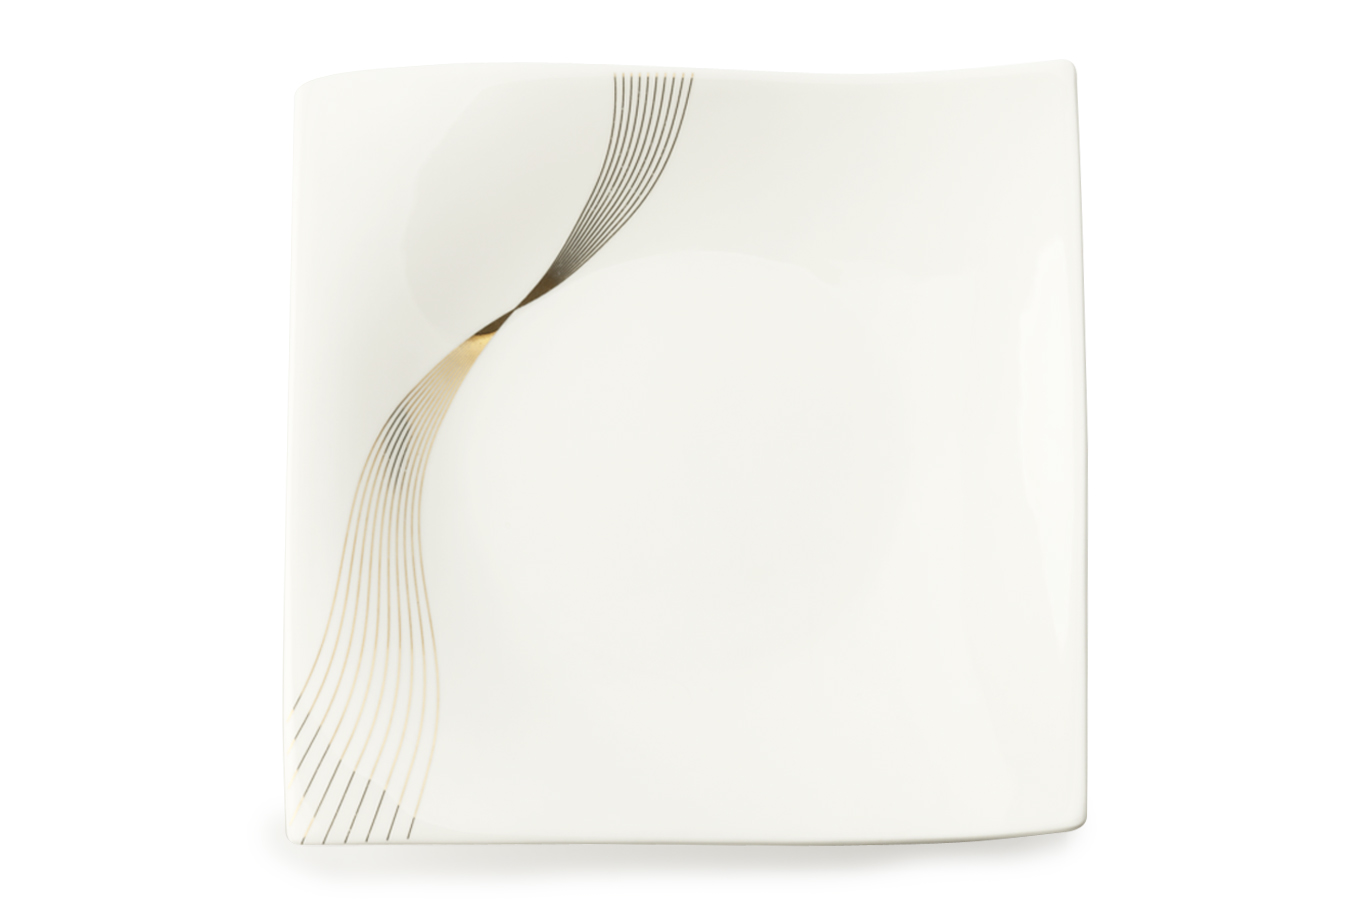 Čtvercový dezertní talíř Frequency 15 x 15 cm - Maxwell&Williams